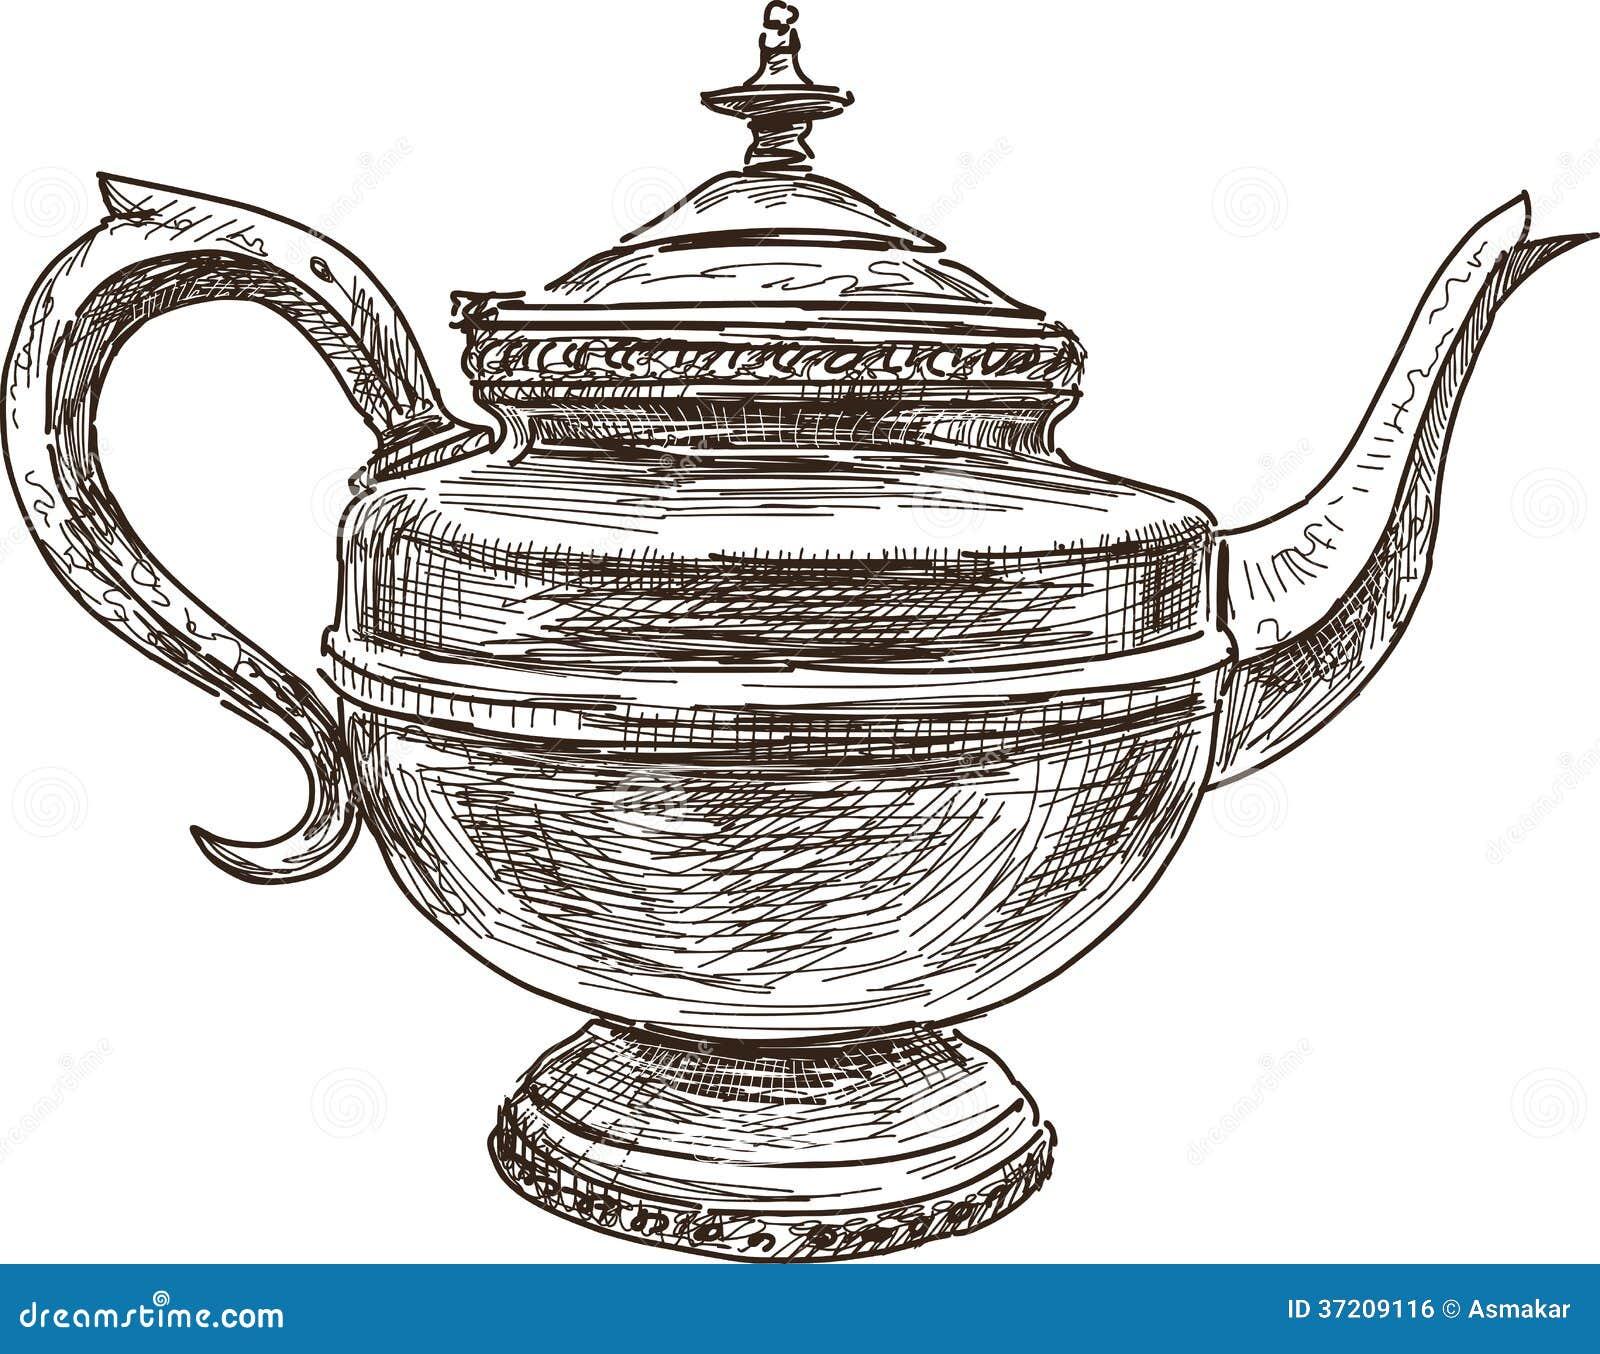 Antique Teapot Royalty Free Stock Image - Image: 37209116